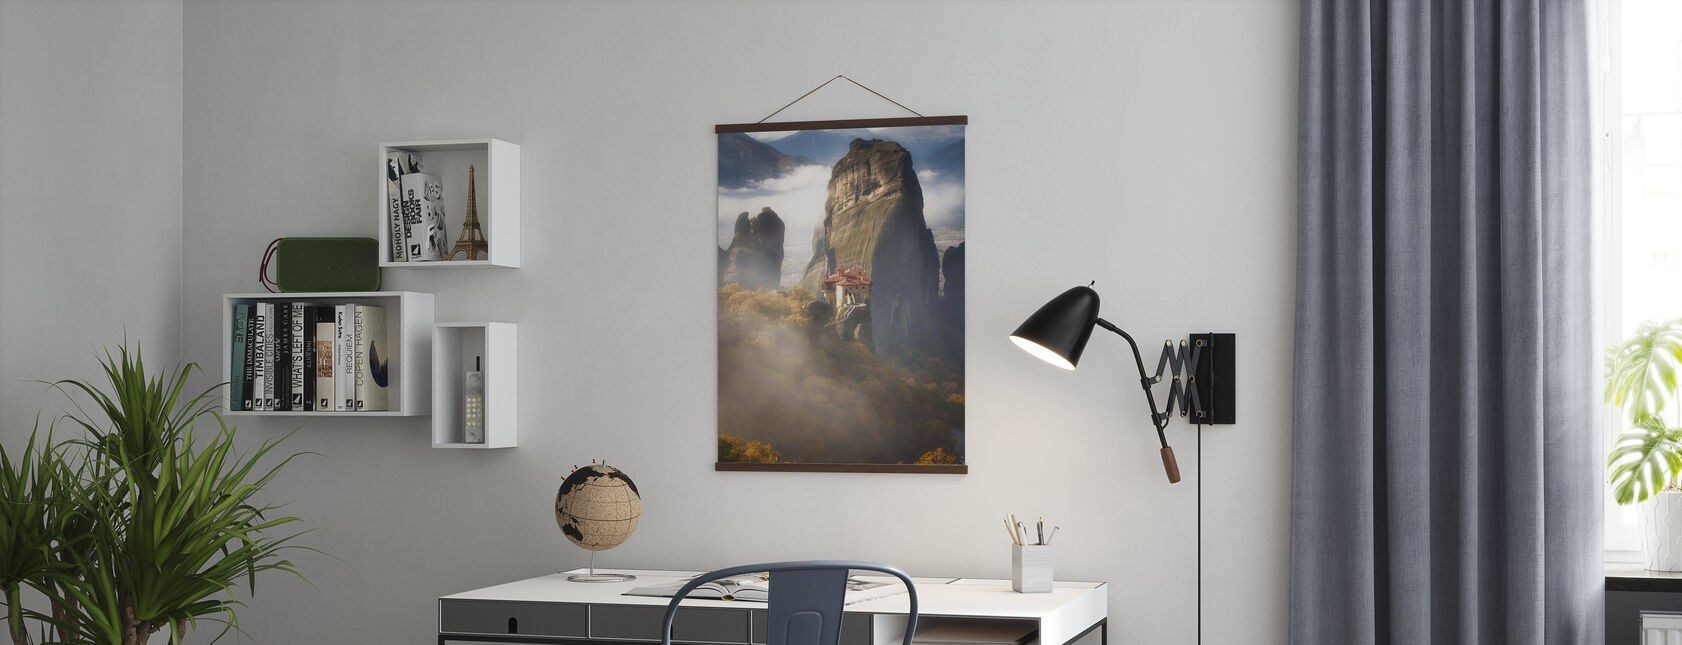 Misty Meteora - Poster - Kontor